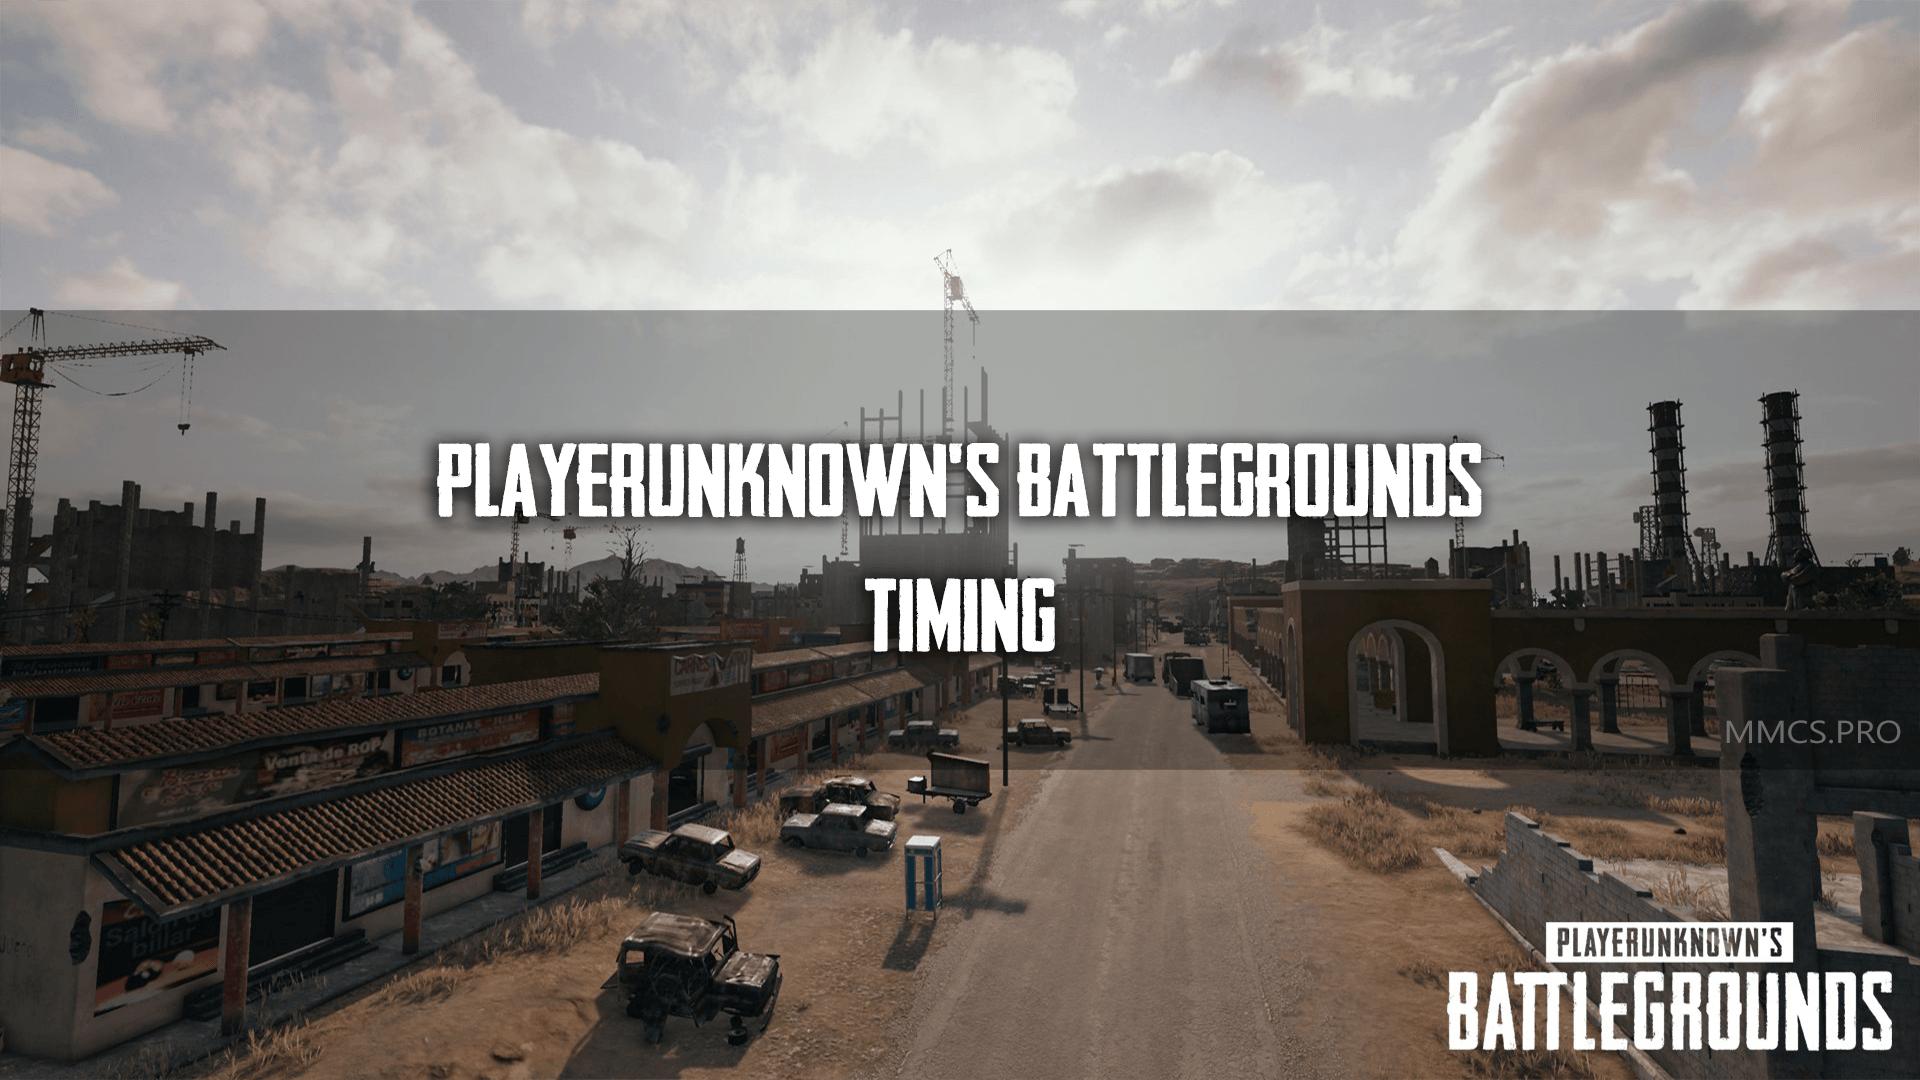 https://mmcs.pro/timing-playerunknowns-battlegrounds/